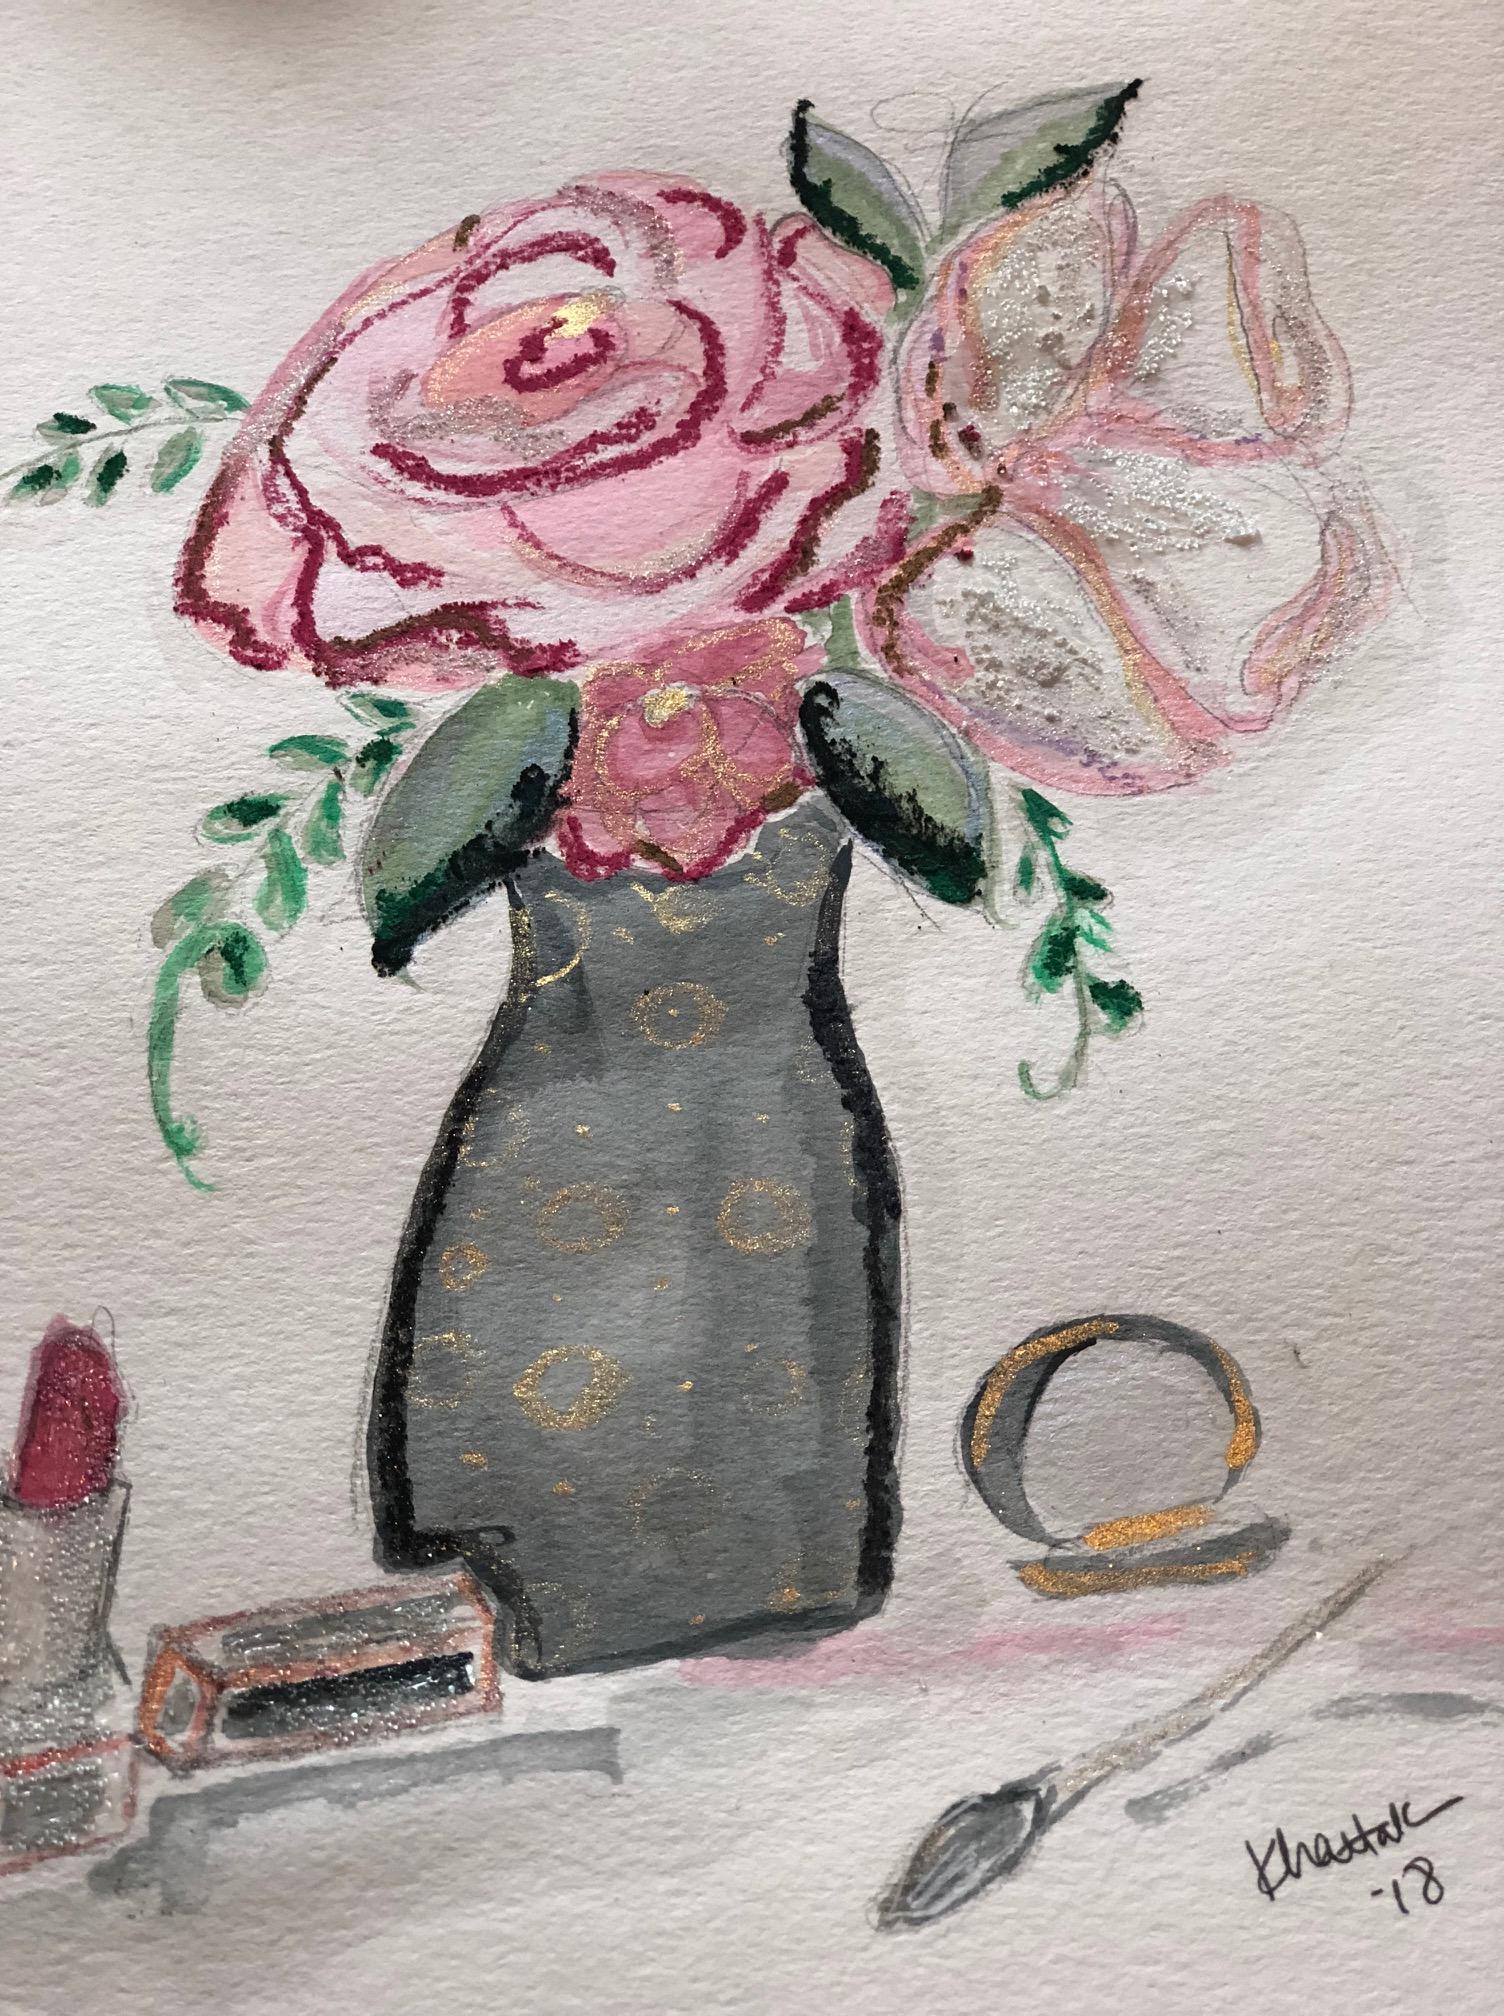 flowers-lipstic-powder-mixed-media-illustration